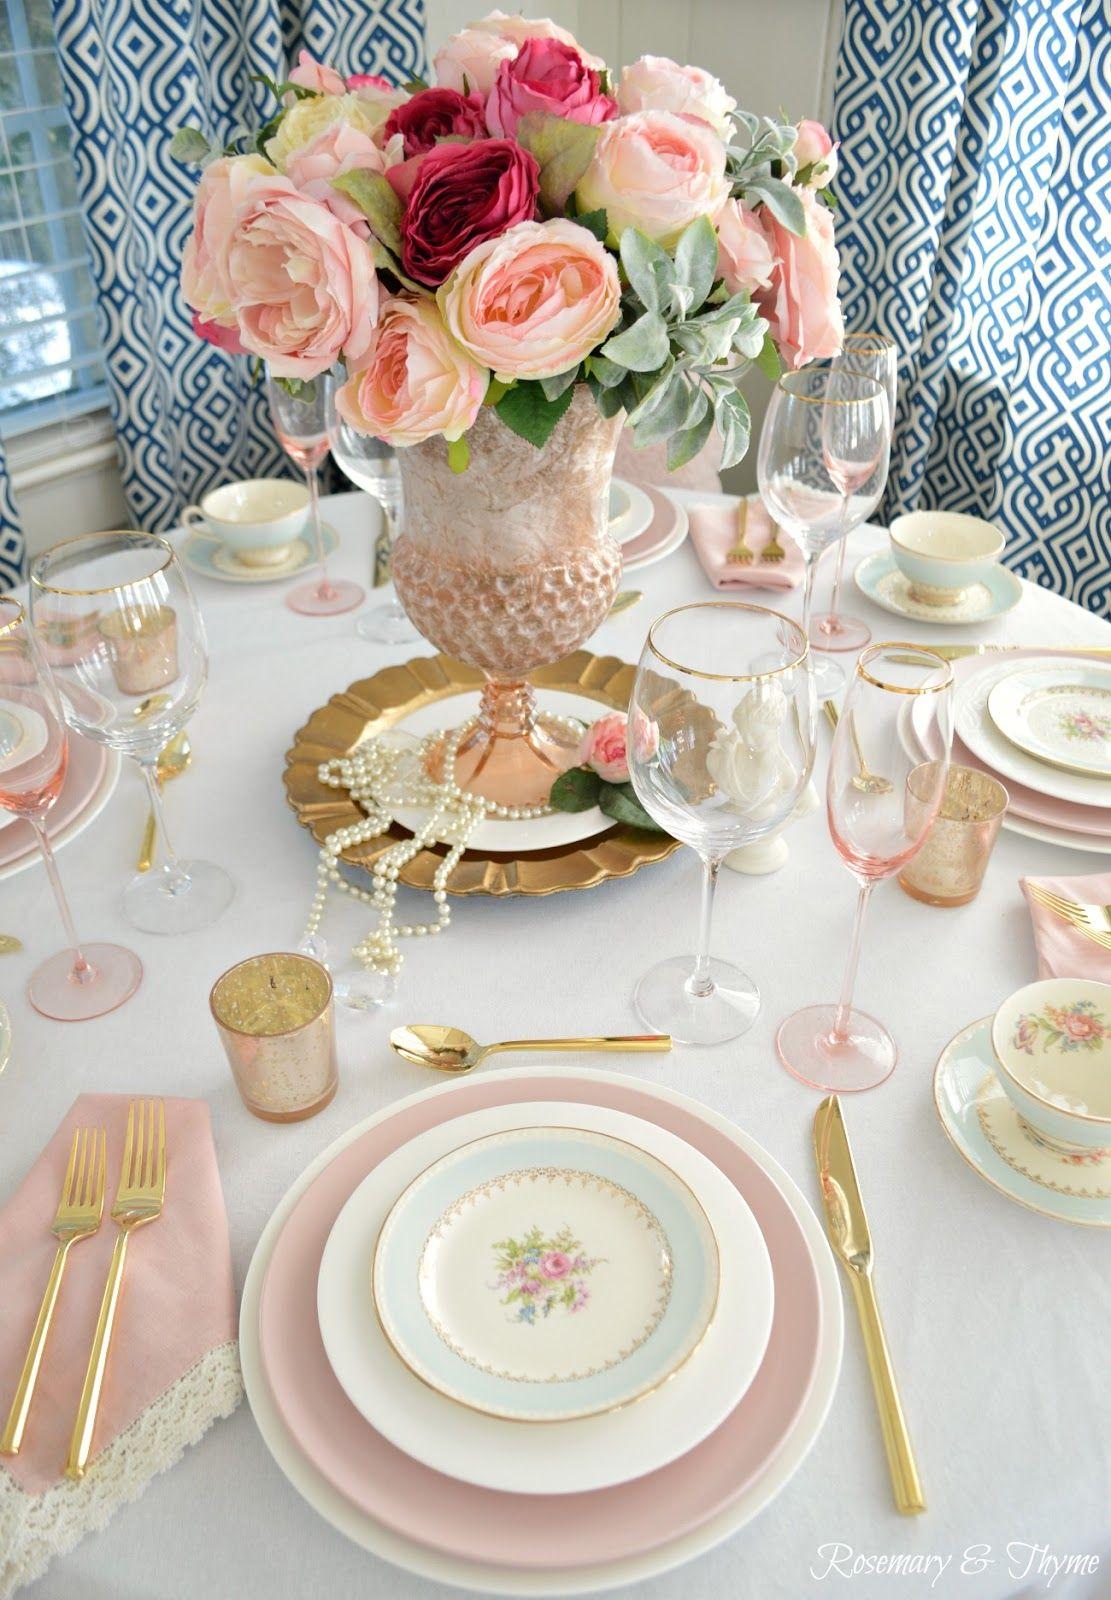 Romantic Girly Tablescape Feminine Table Brunch Table Setting